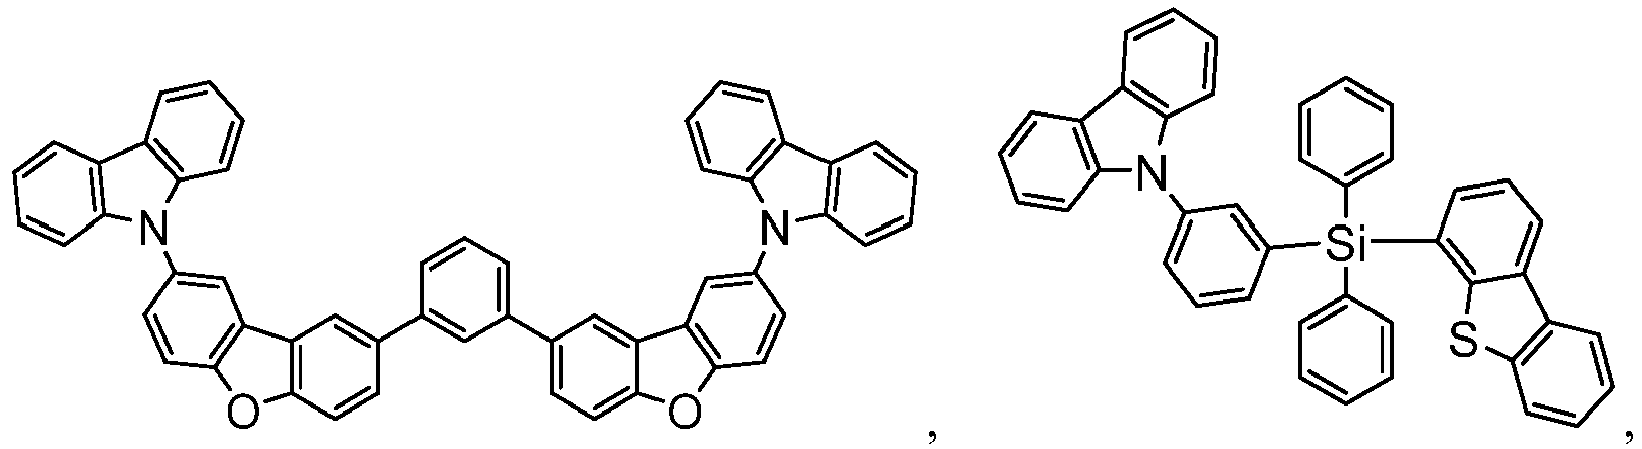 Figure imgb0891